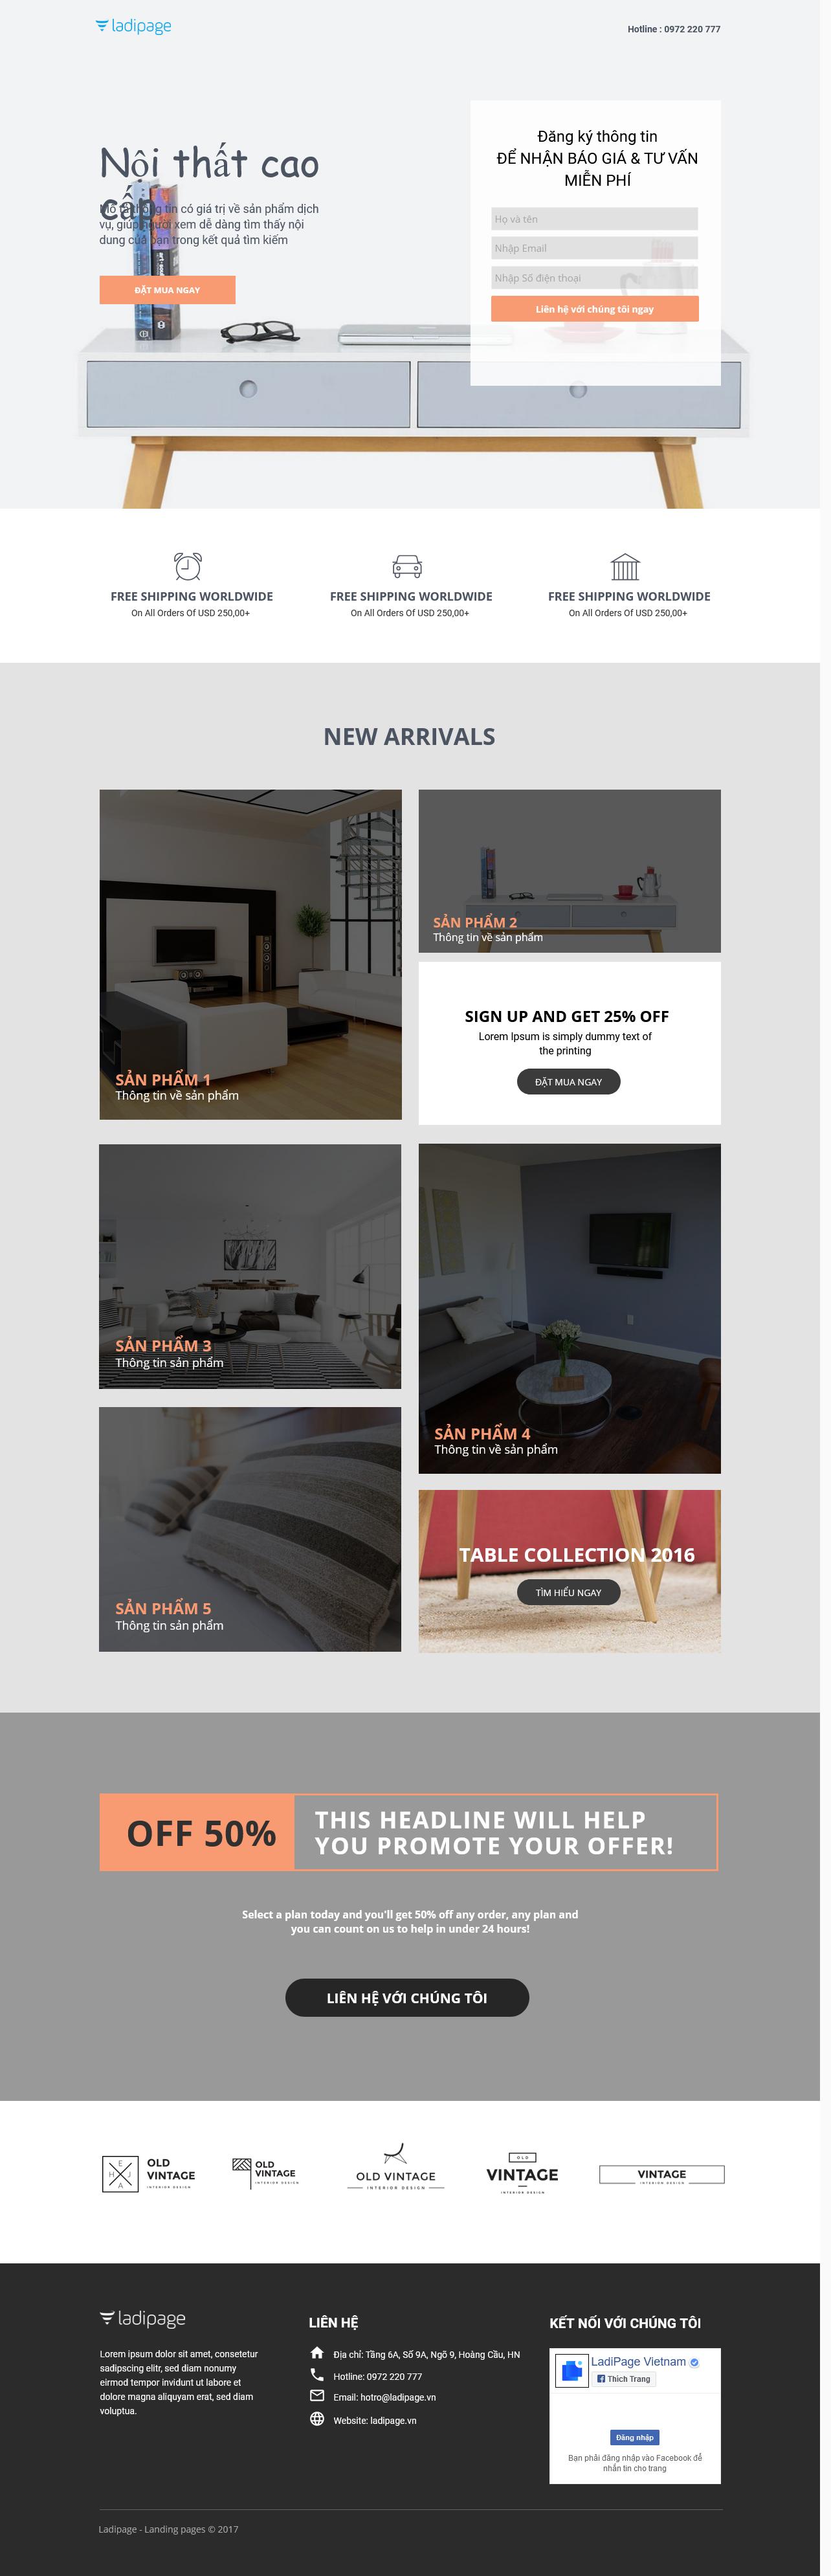 Thiết kế website Thiết kế webiste landingpage noi-that---ngoai-that Nội thất 15